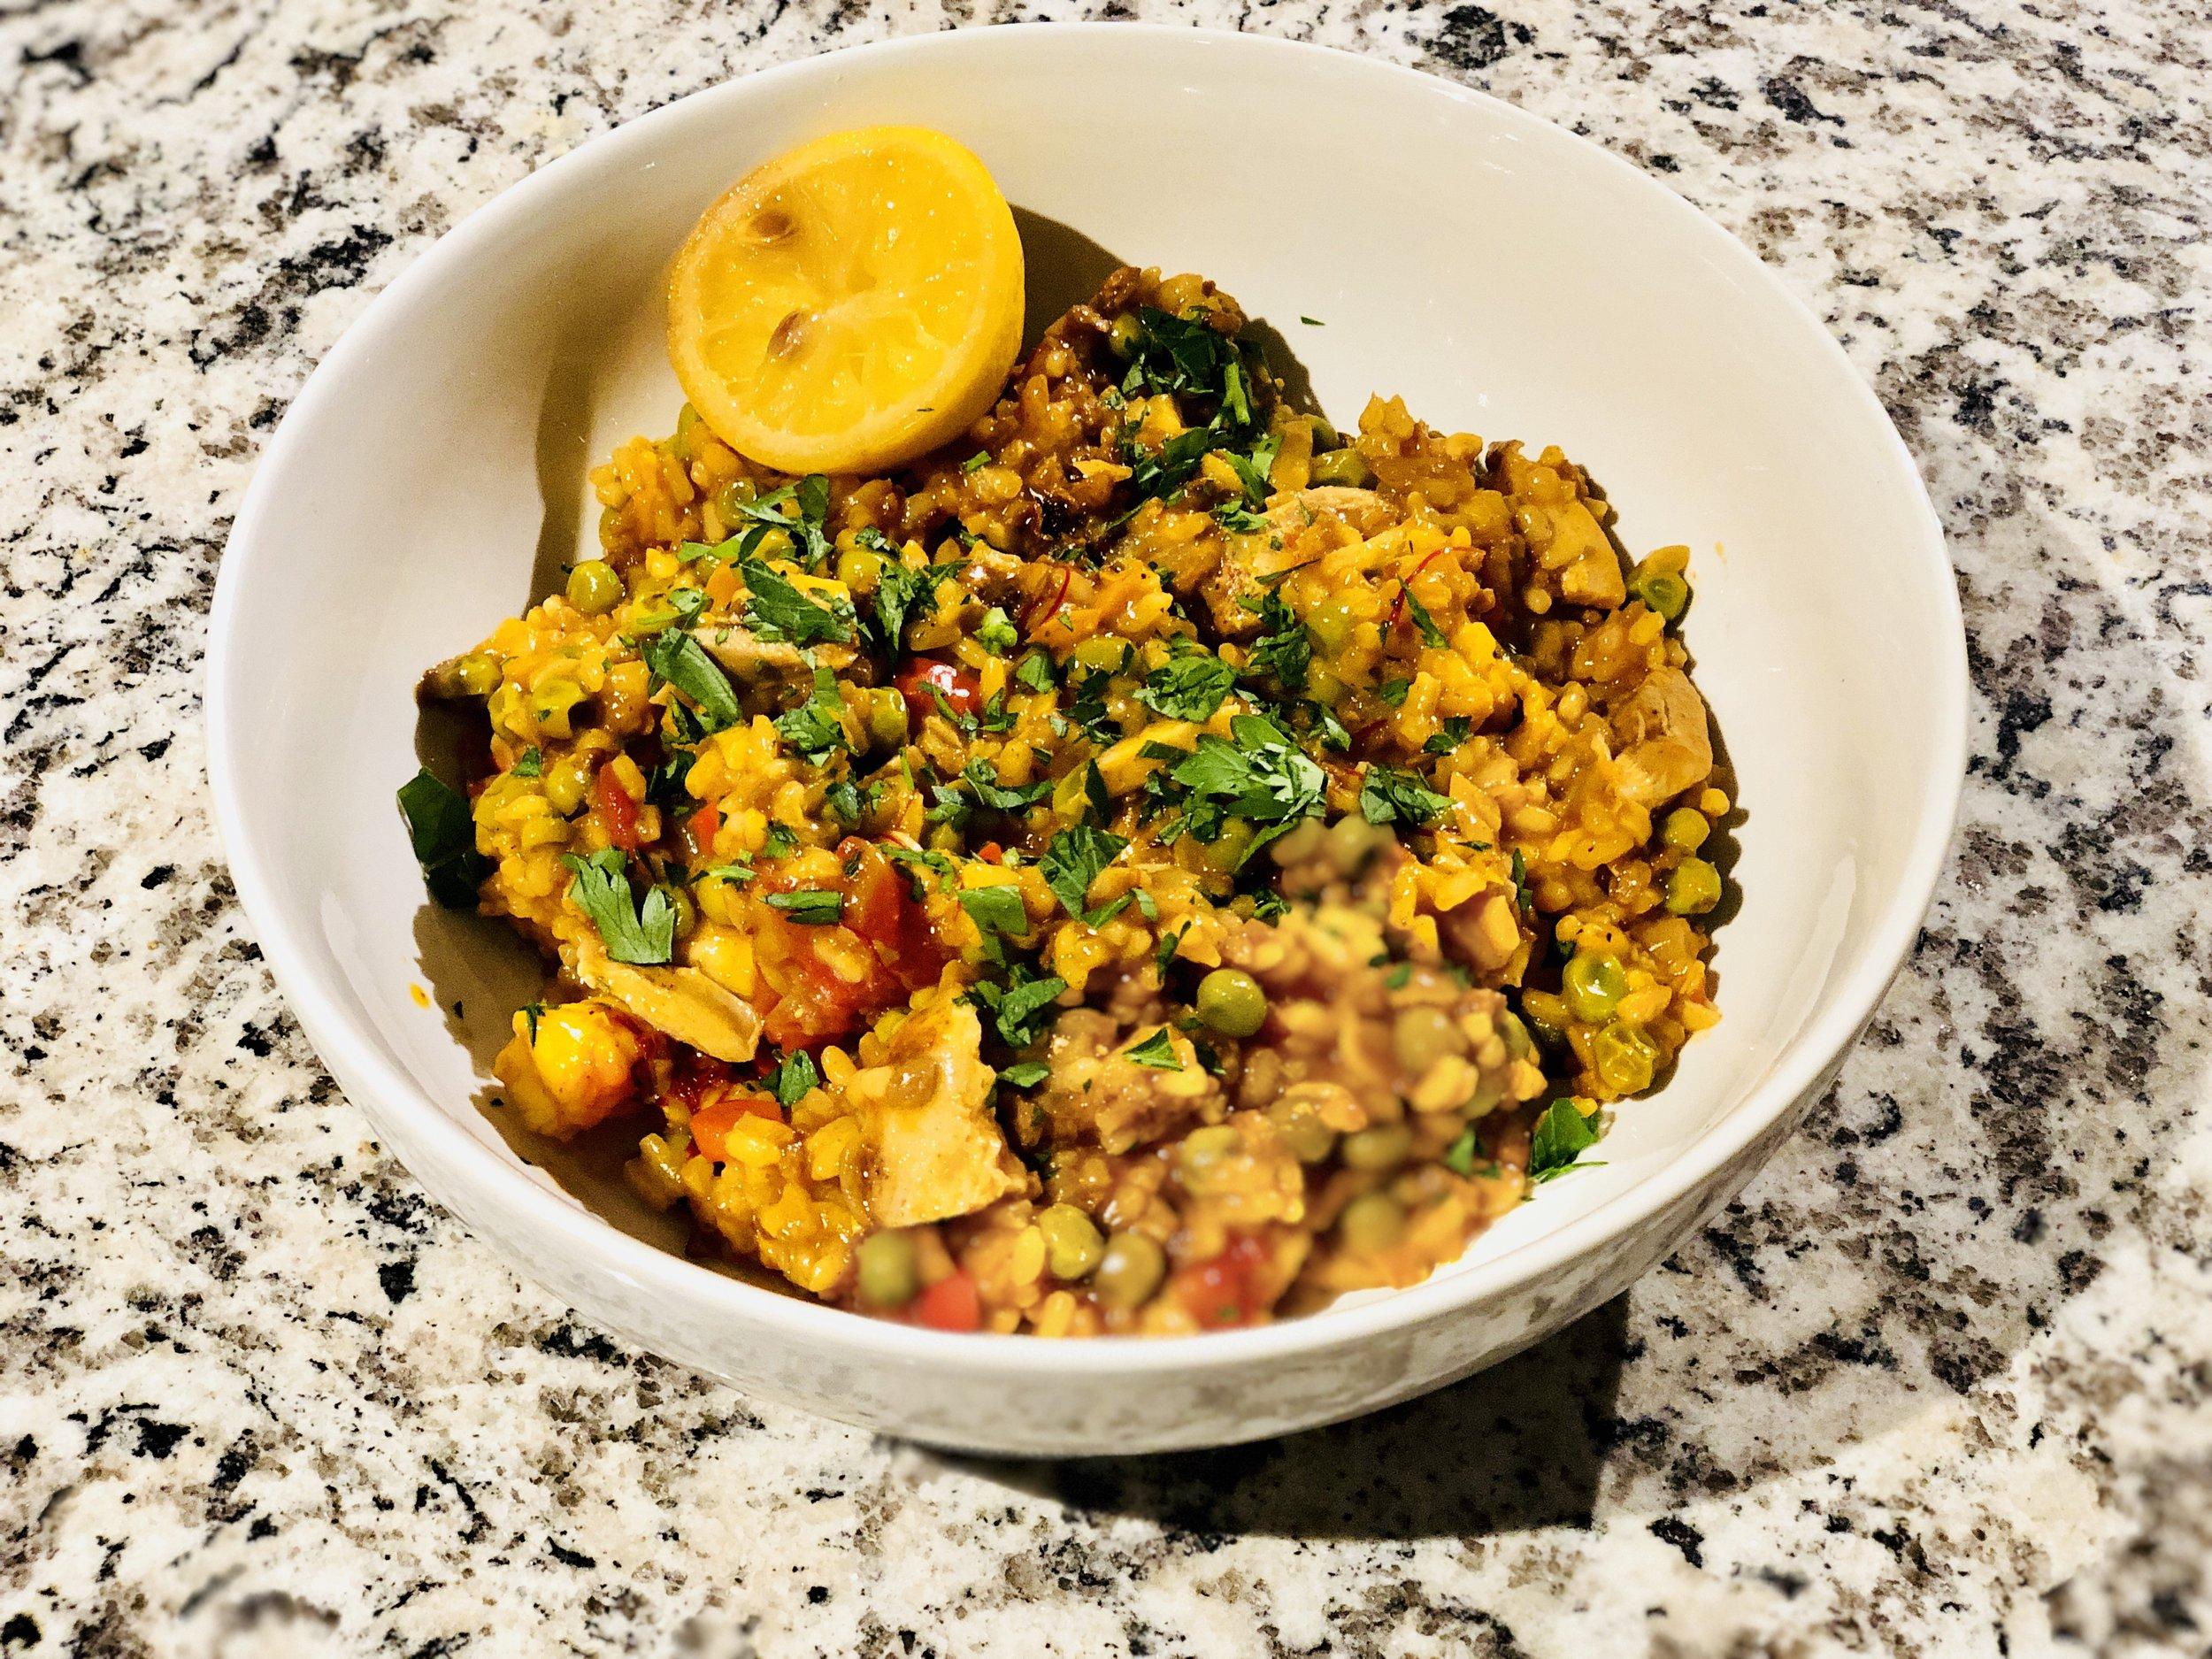 Saffron Shrimp and Chicken Thigh Paella Erica Bethe Jewtalian.jpg